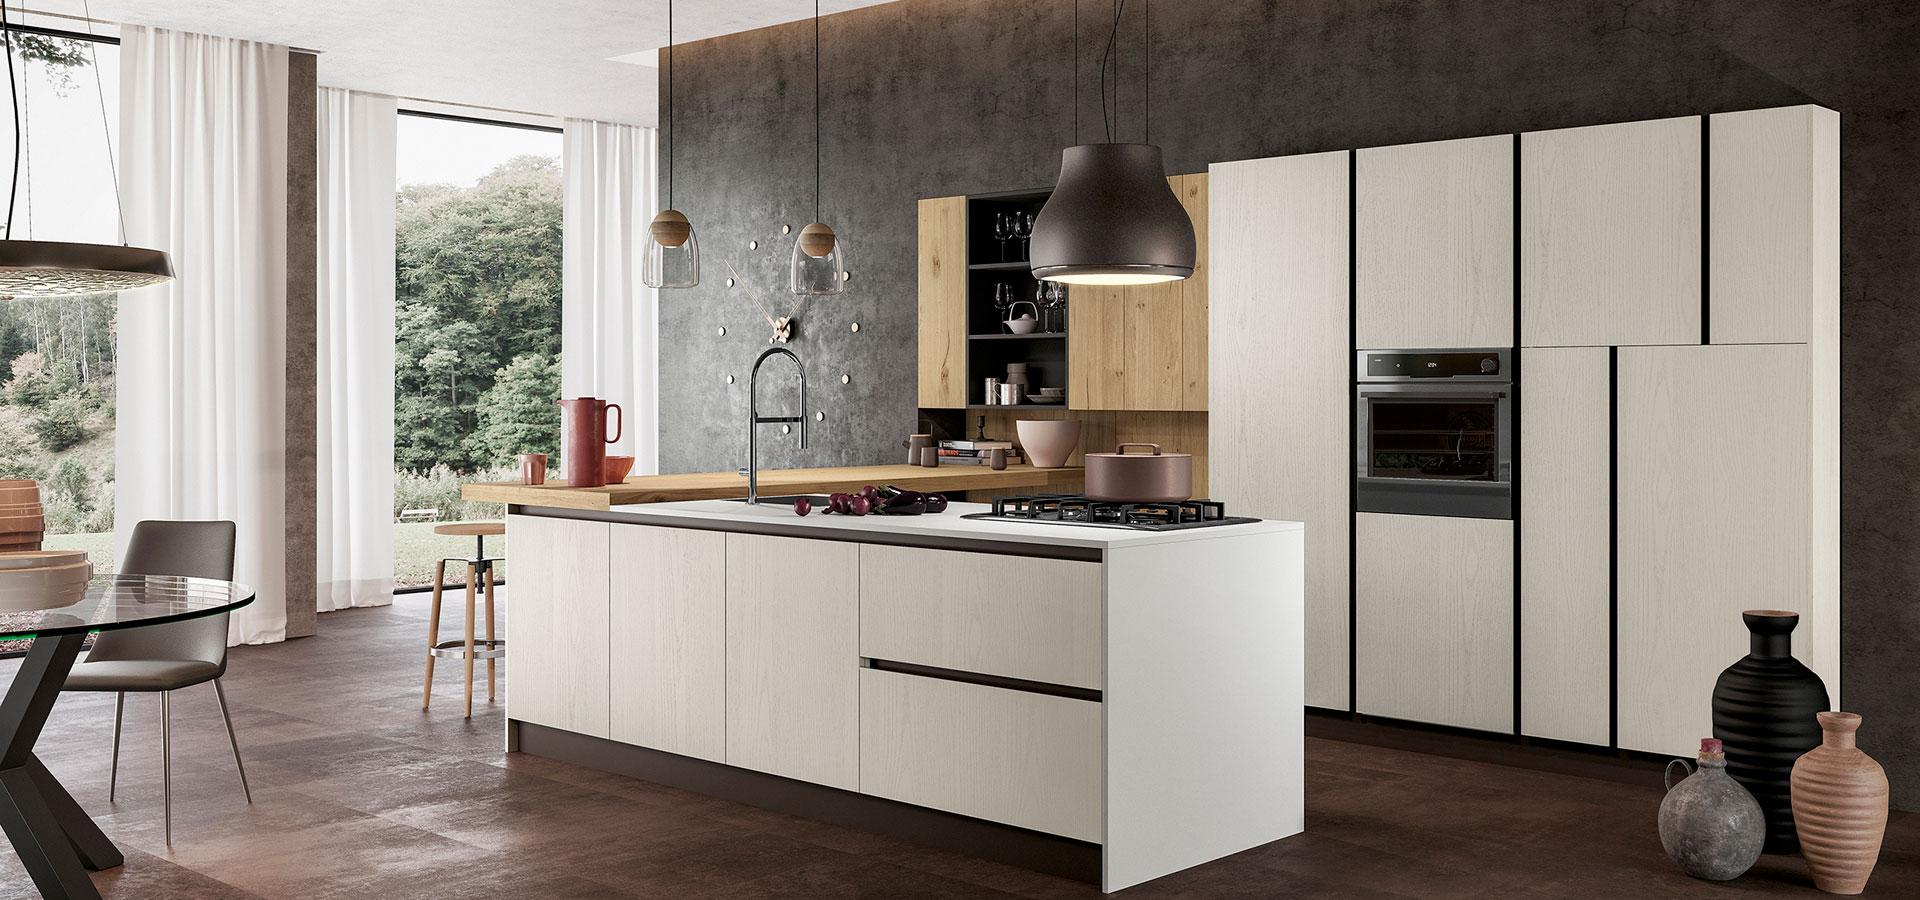 Arredo3-Cucina-Asia-factory-5-moderna-design-componibile ...